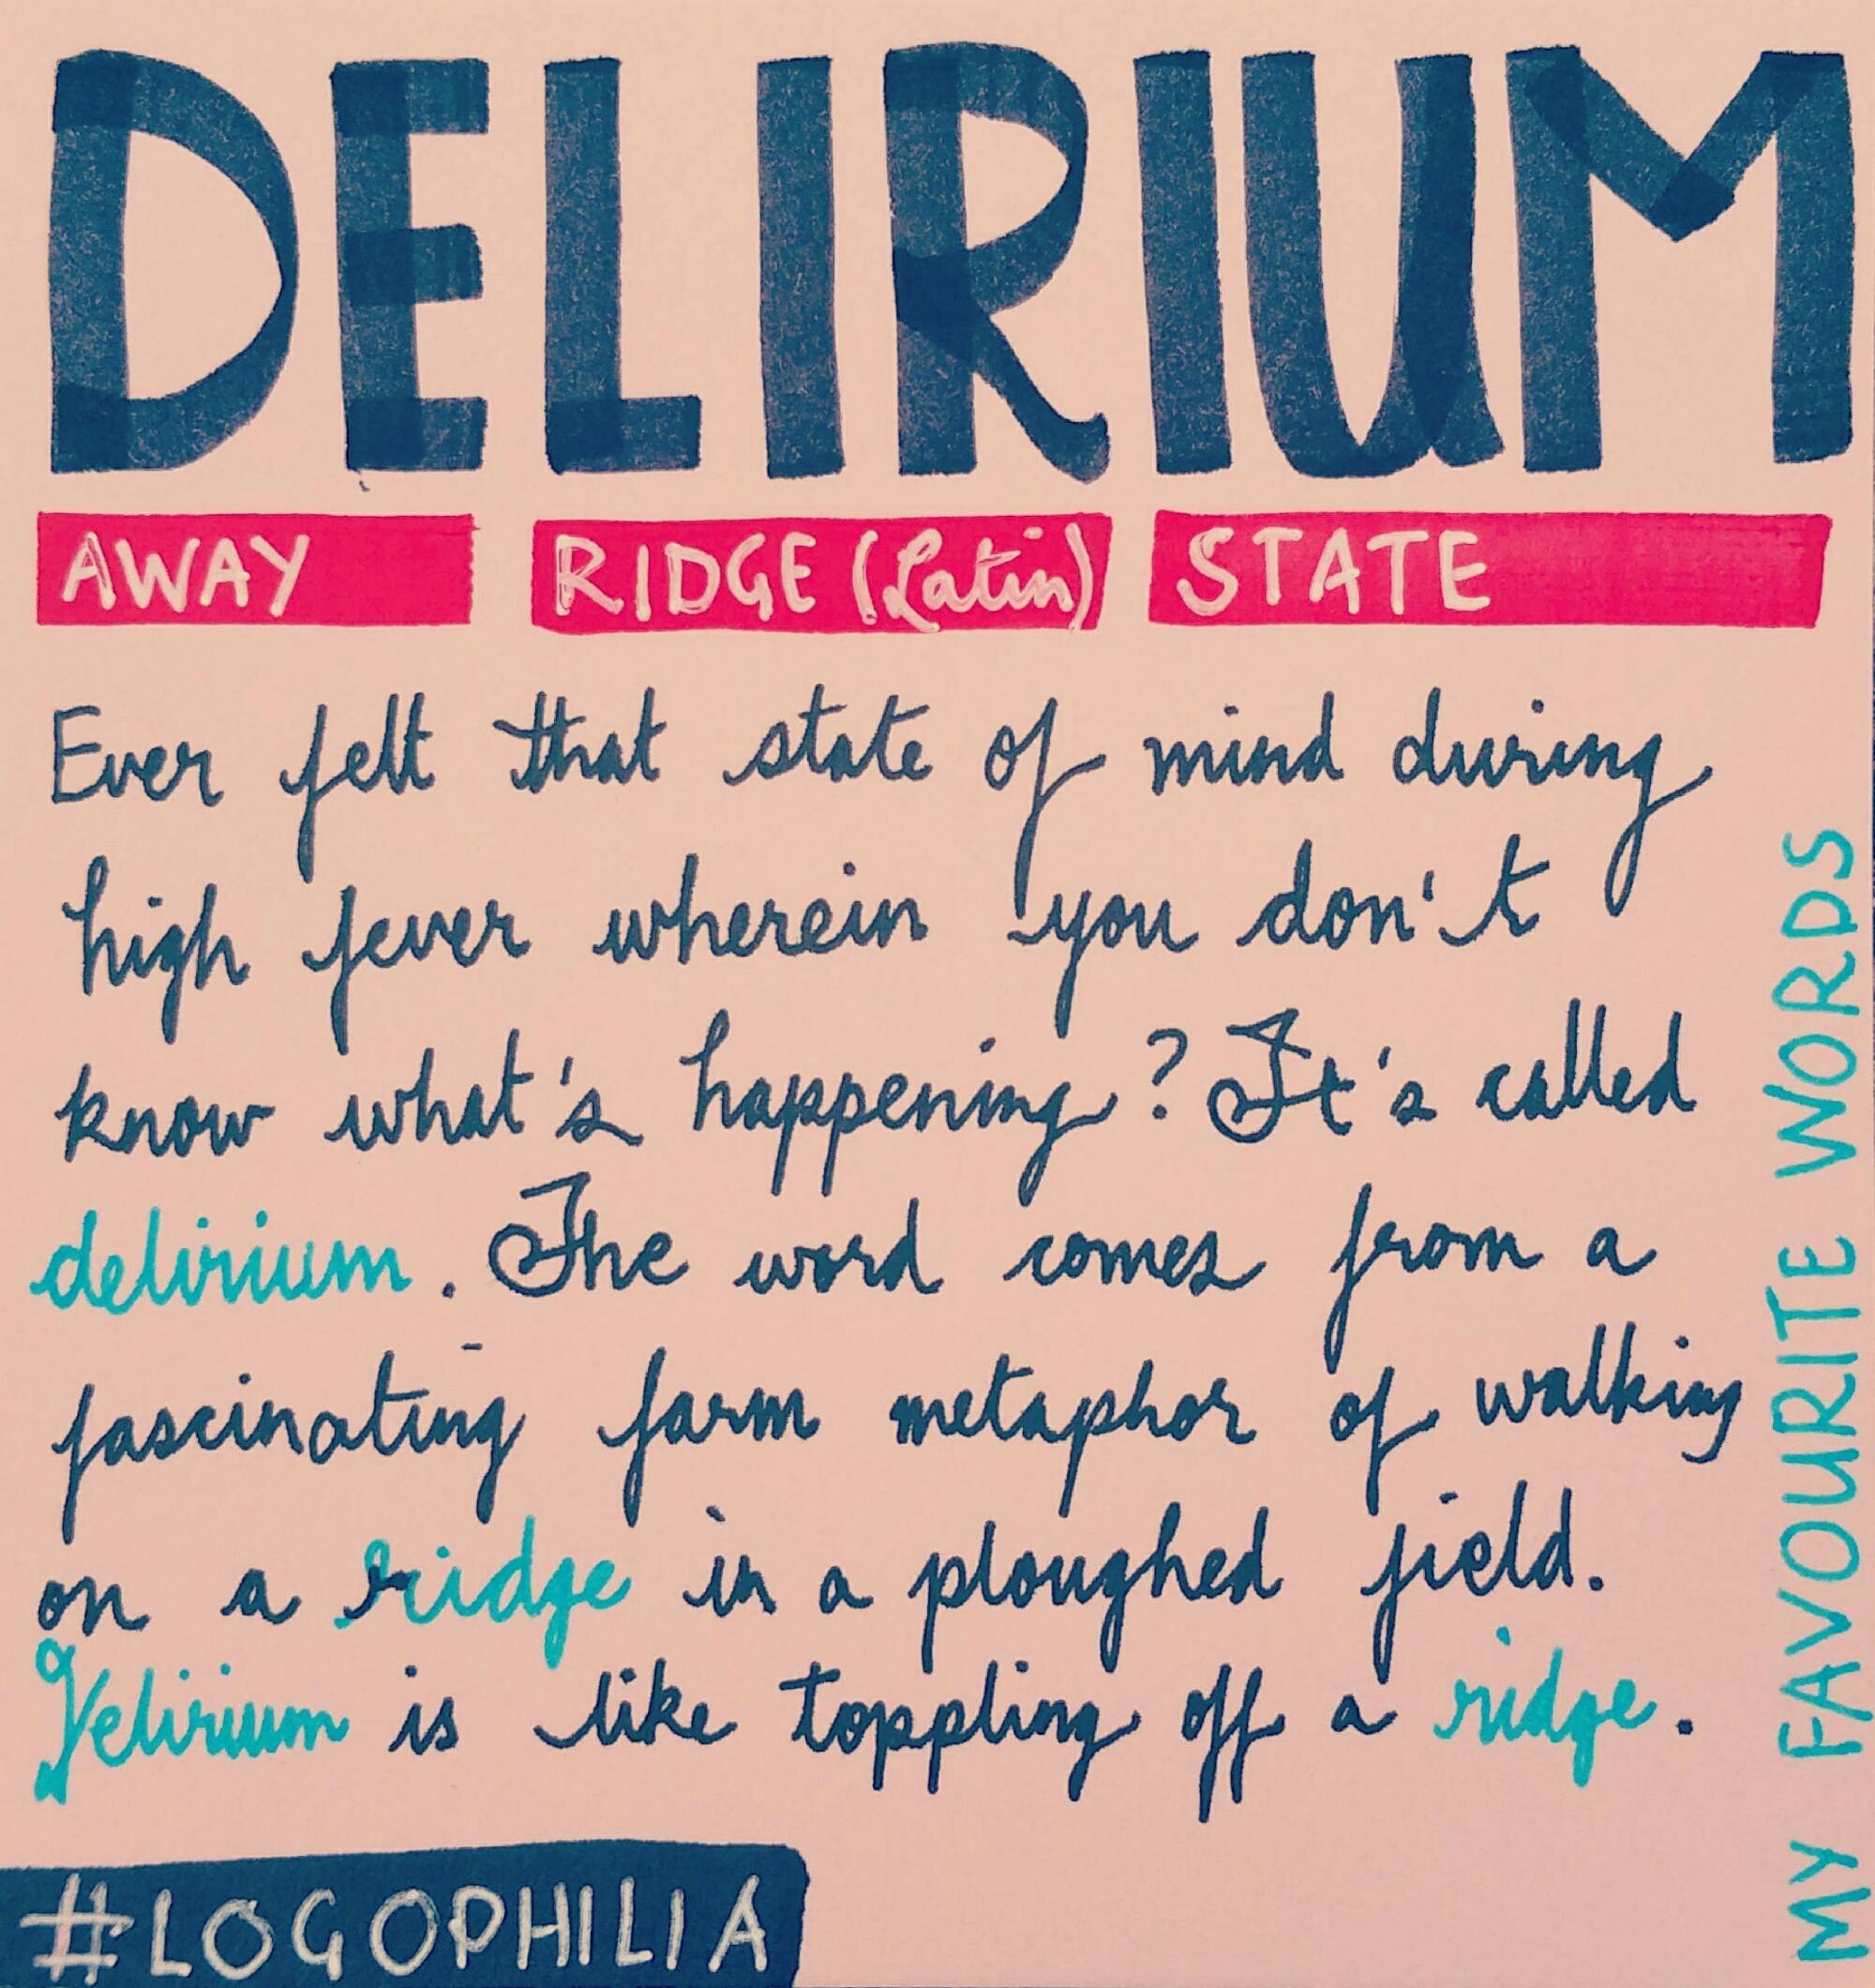 Logophilia Words Vocabulary Etymology Etterwaytolearnenglish Isntthishowyoushouldstudy Picoftheday Love Follow Englishwords Delirium